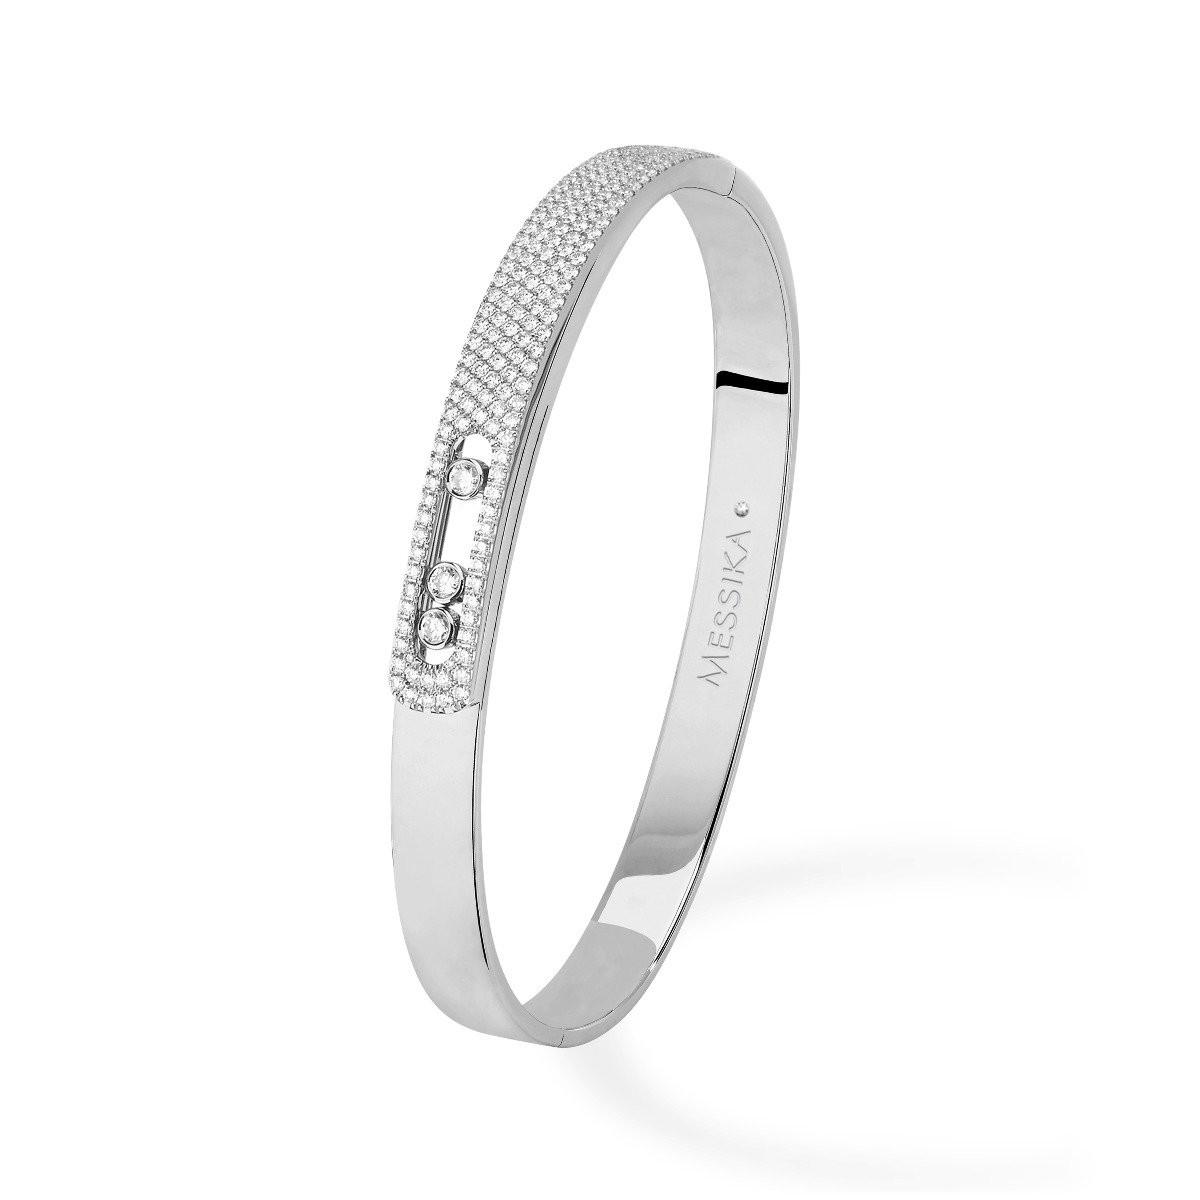 Messika Move Noa Pavé Diamond Bangle Bracelet in 18K Gold front view